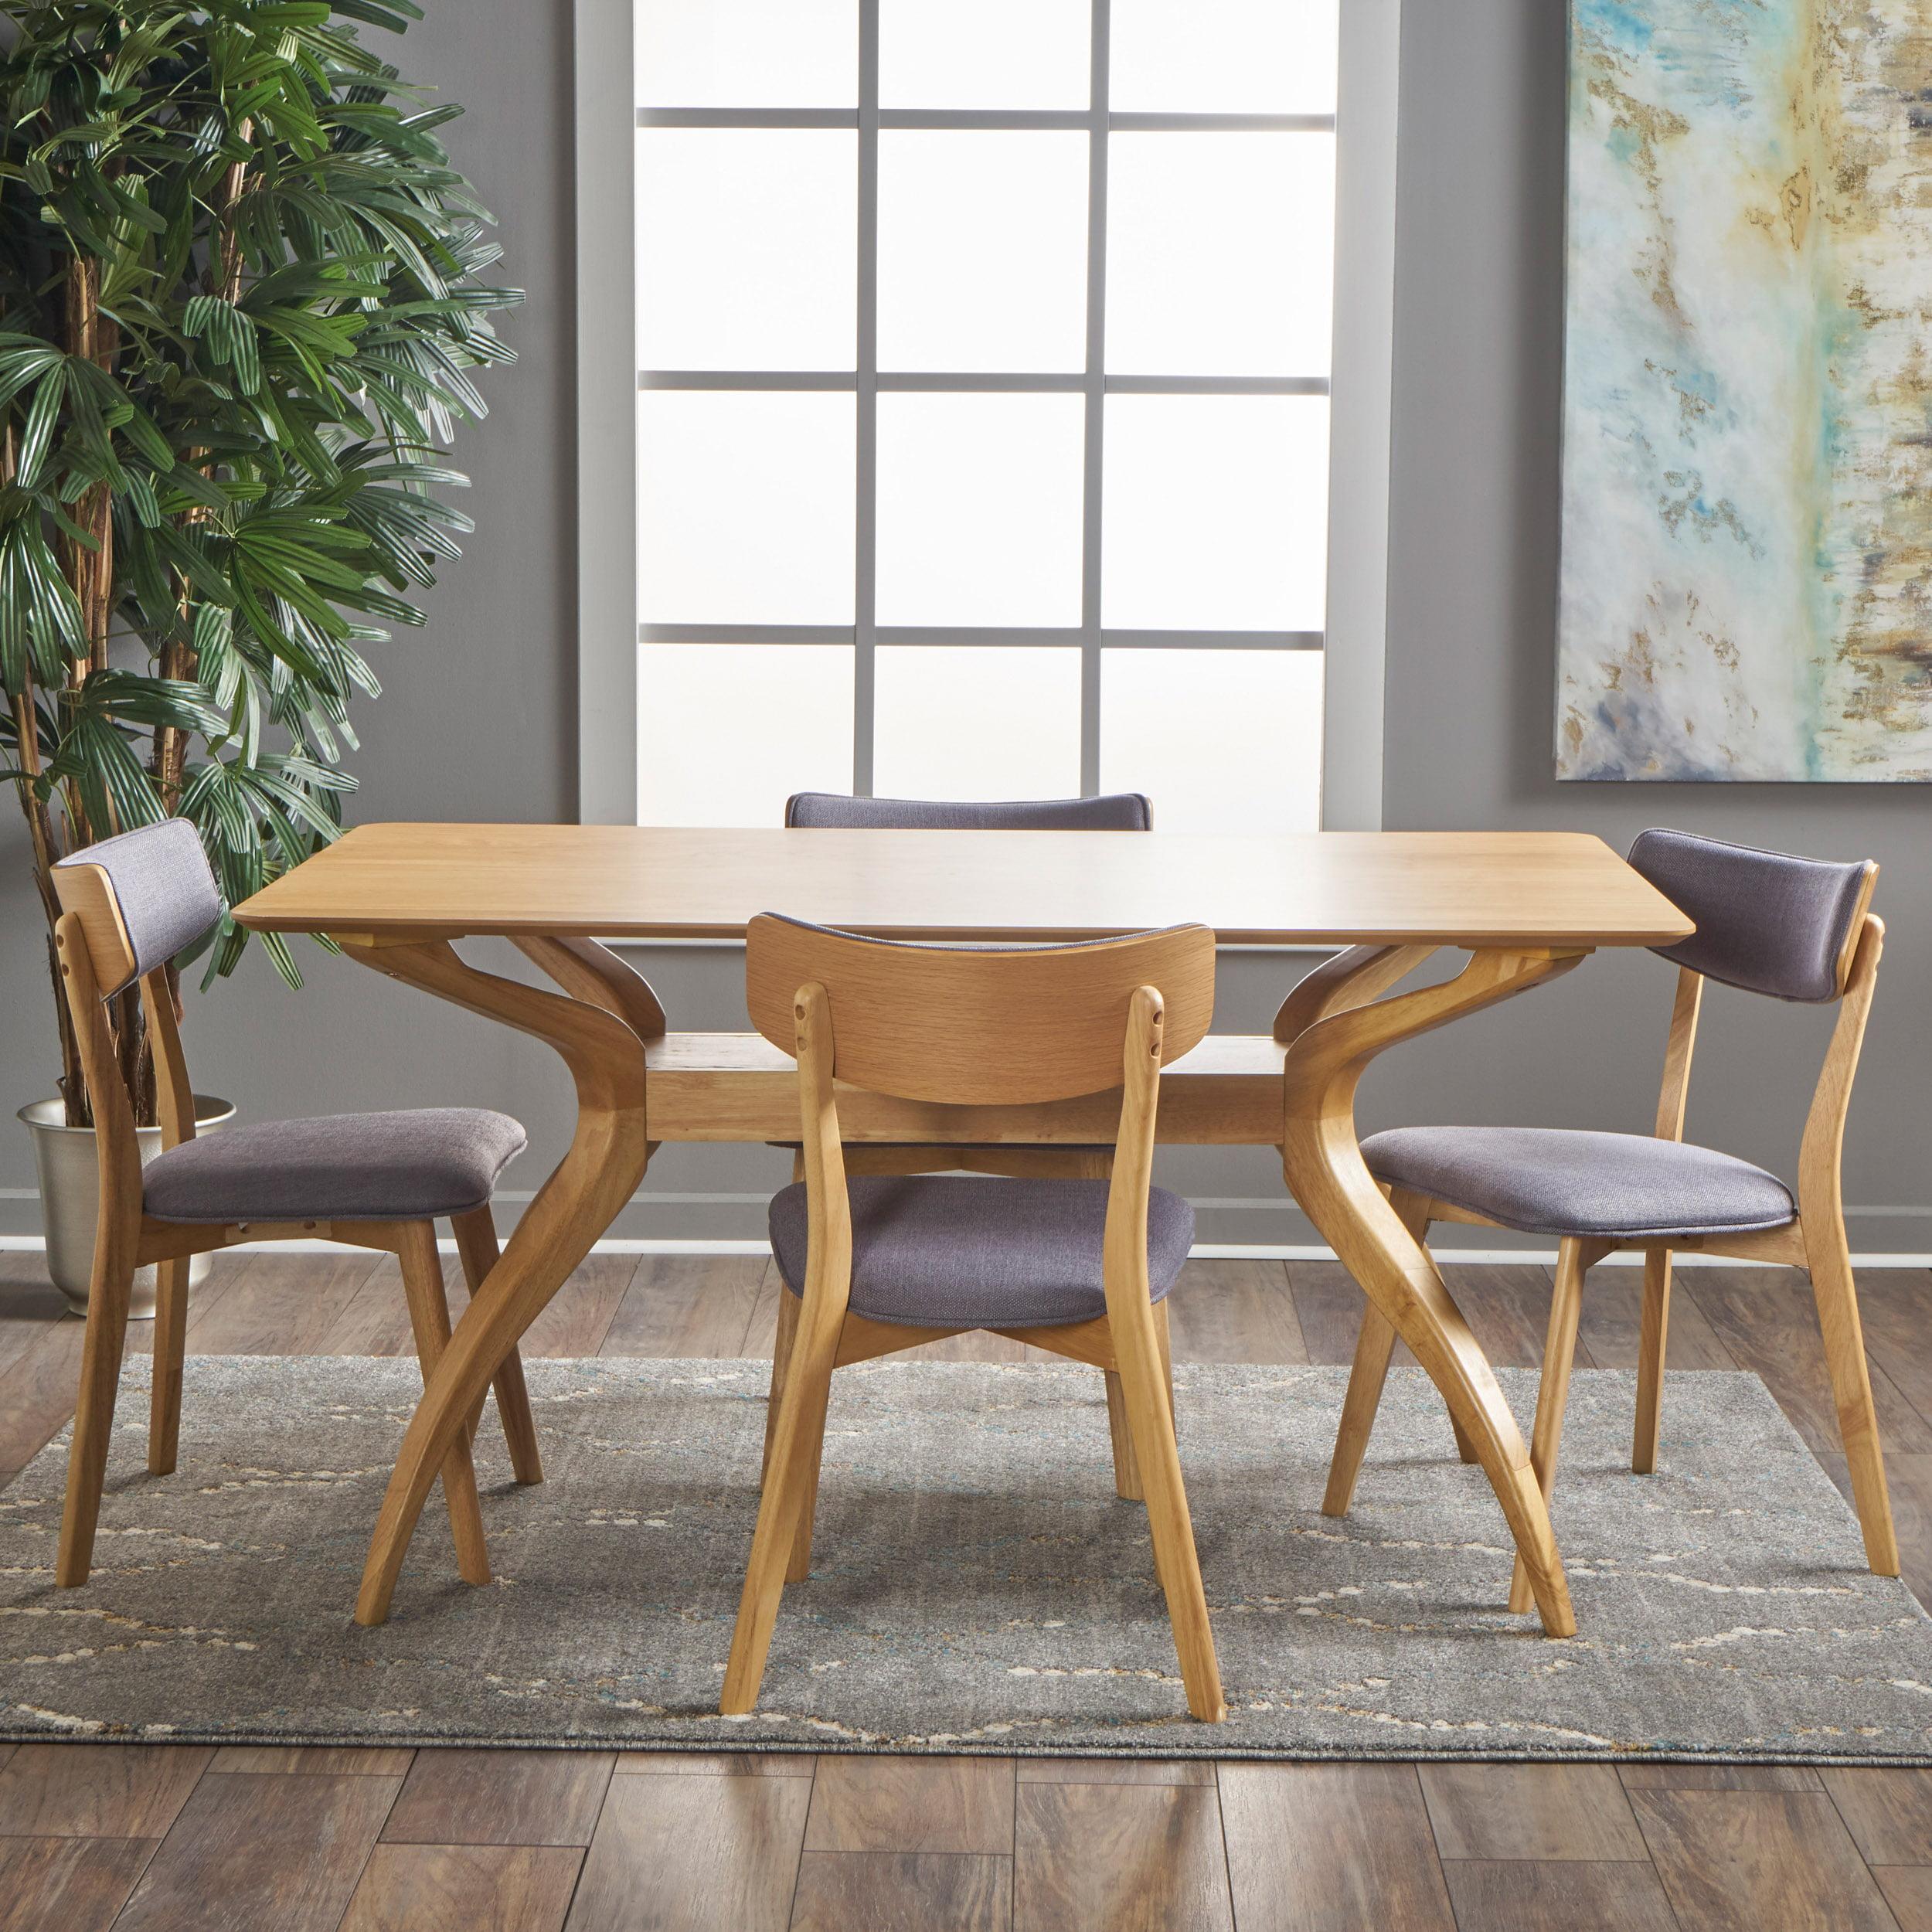 Noble House Banbury Mid Century Modern Wood 5 Piece Dining Set, Natural Oak, Dark Grey